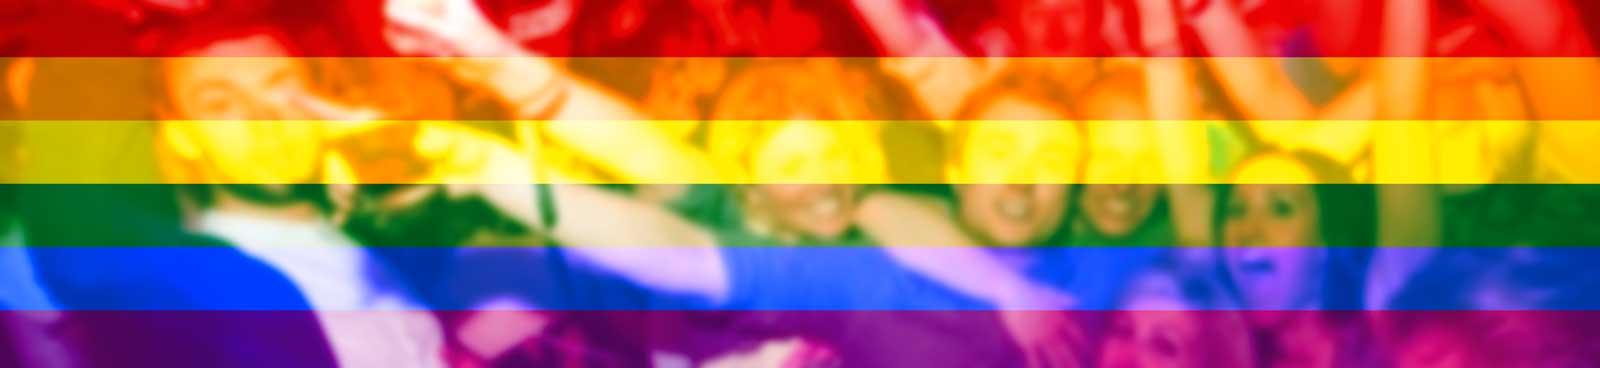 Despedida-soltero-rainbow-orgeventosyespectaculos.com